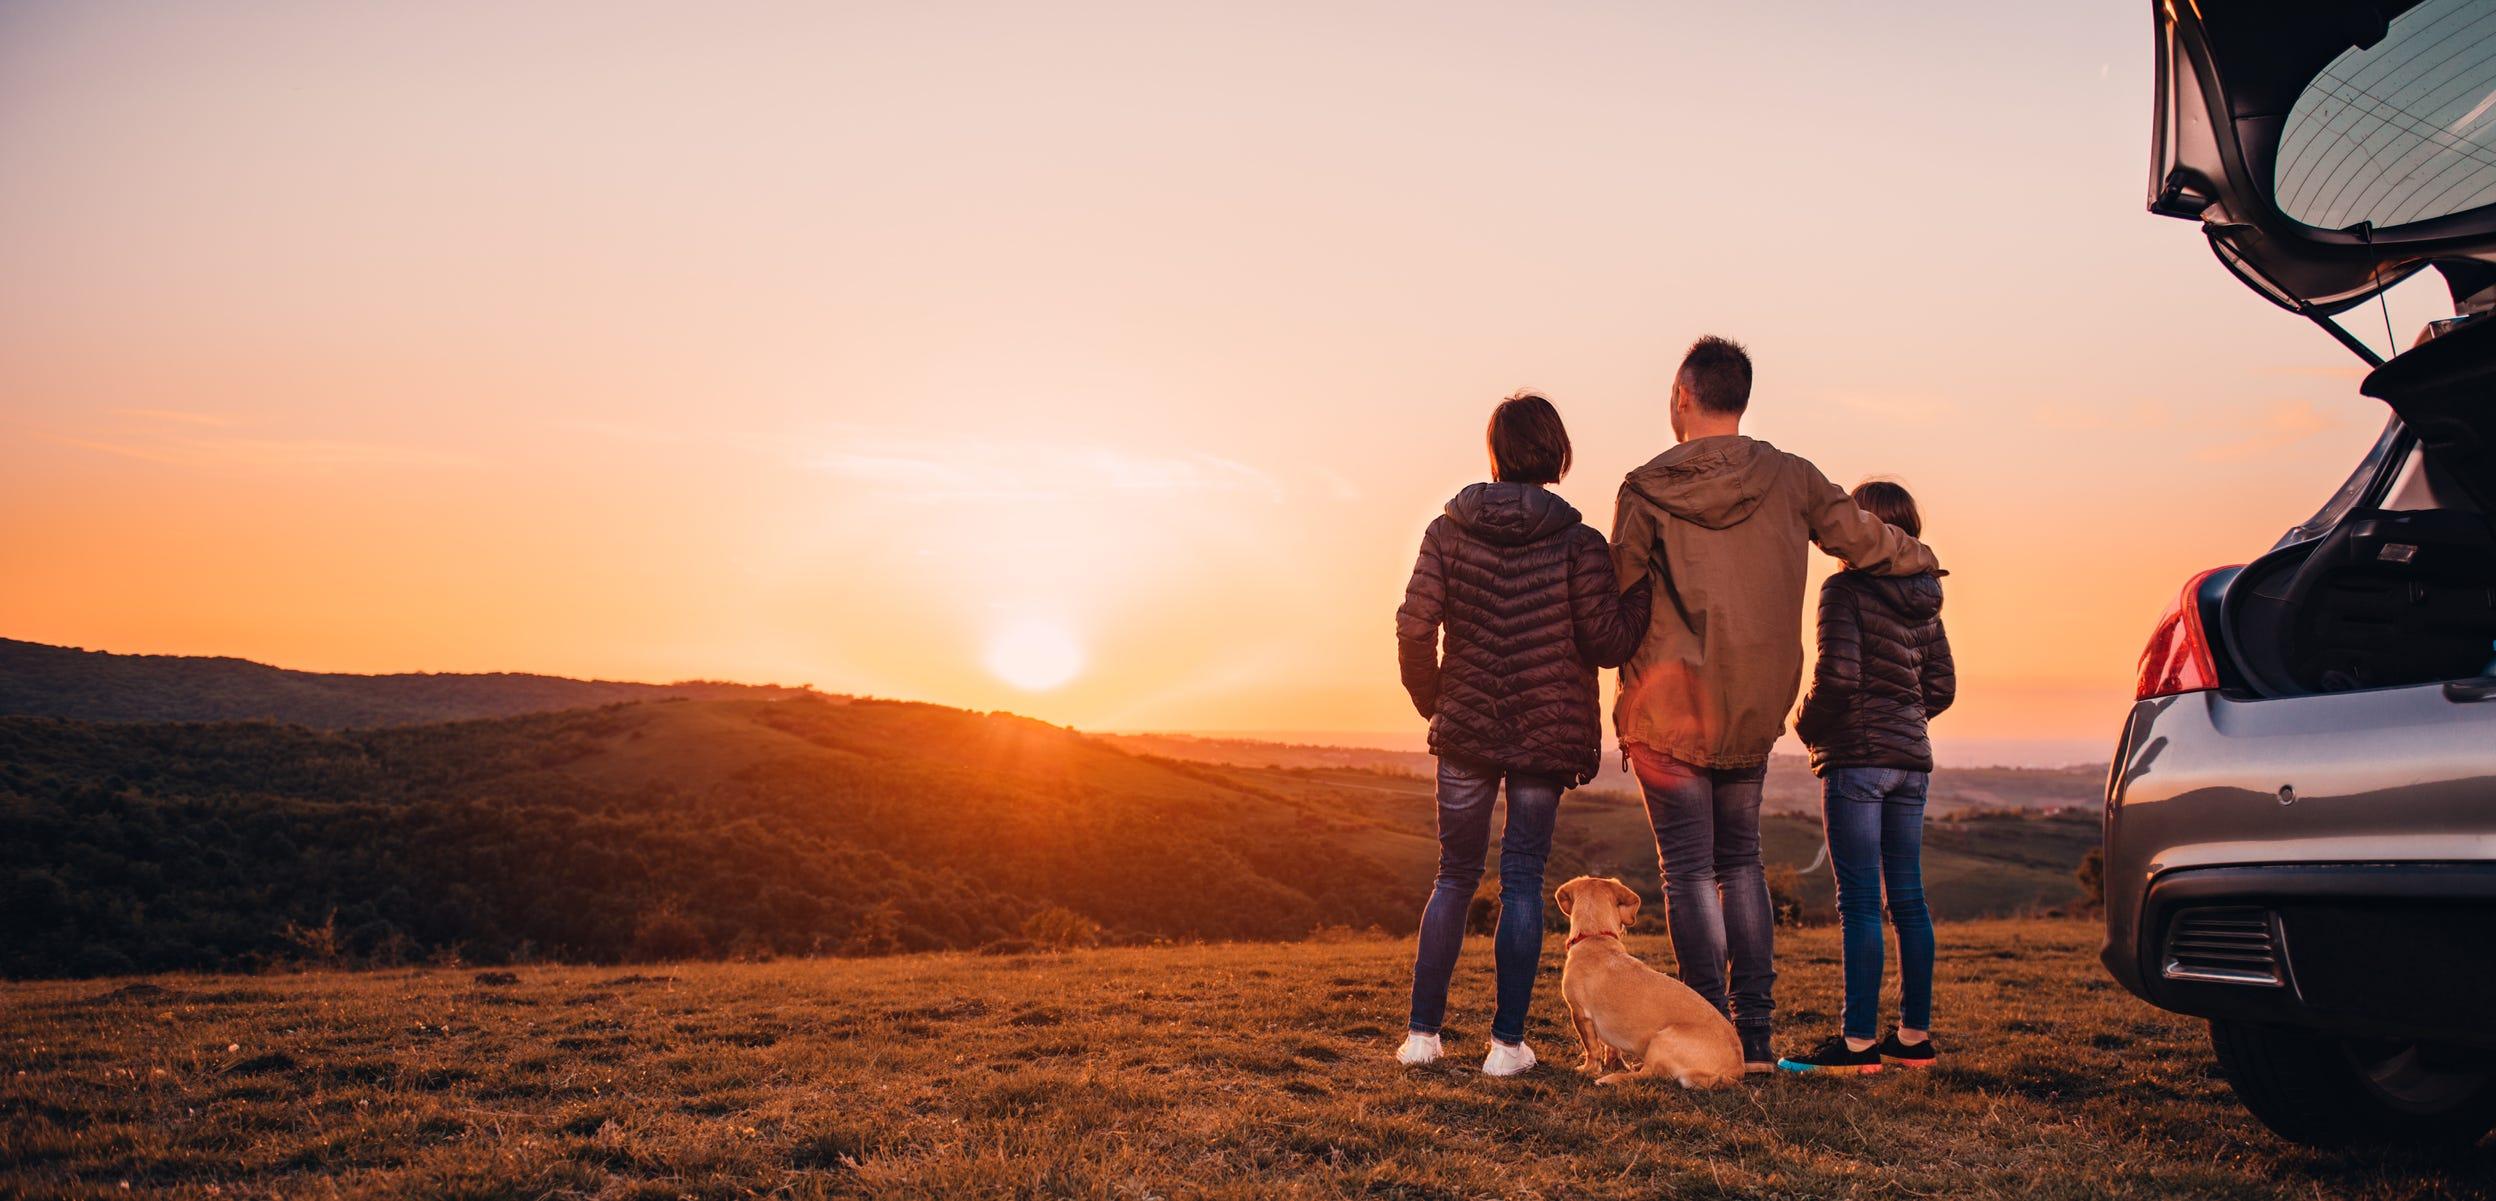 Americans torn between taking vacation and avoiding coronavirus, surveys find